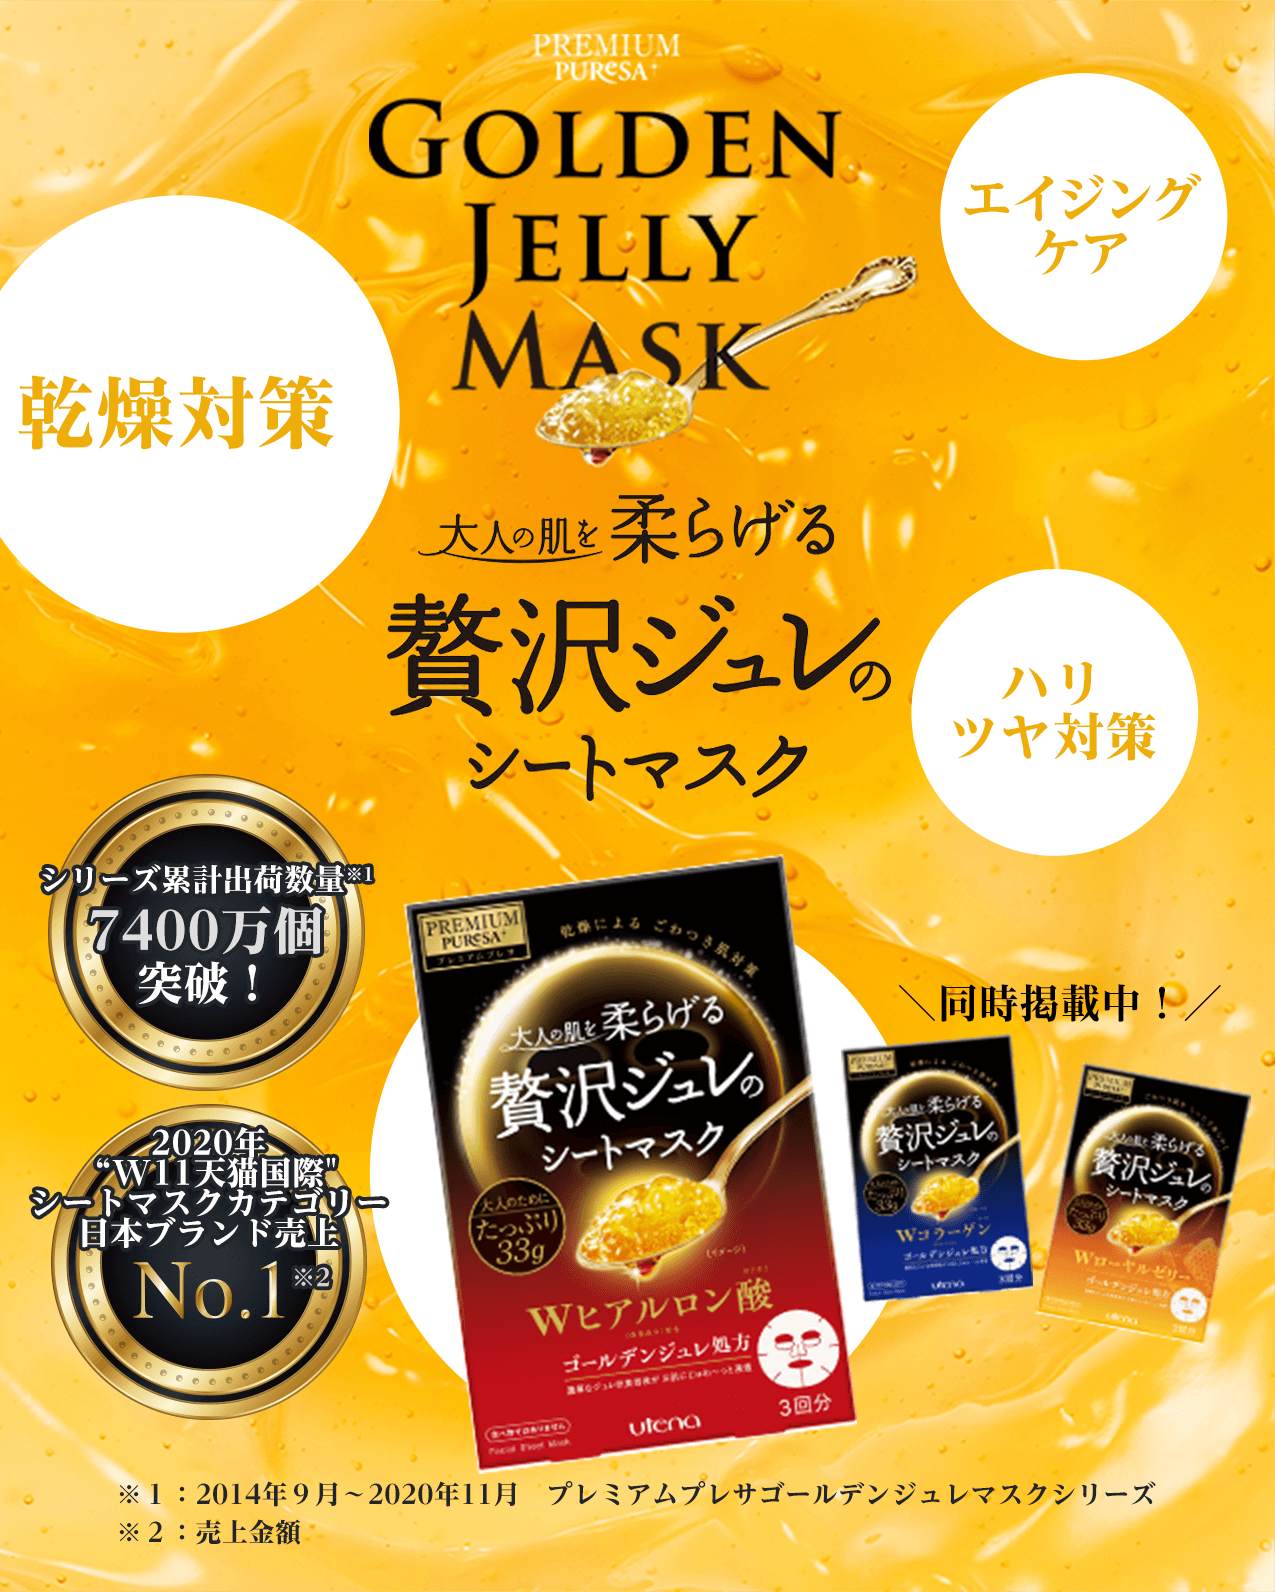 PREMIUM PUReSA GOLDEN JELLY MASK 大人の肌を柔らげる贅沢ジュレのシートマスク